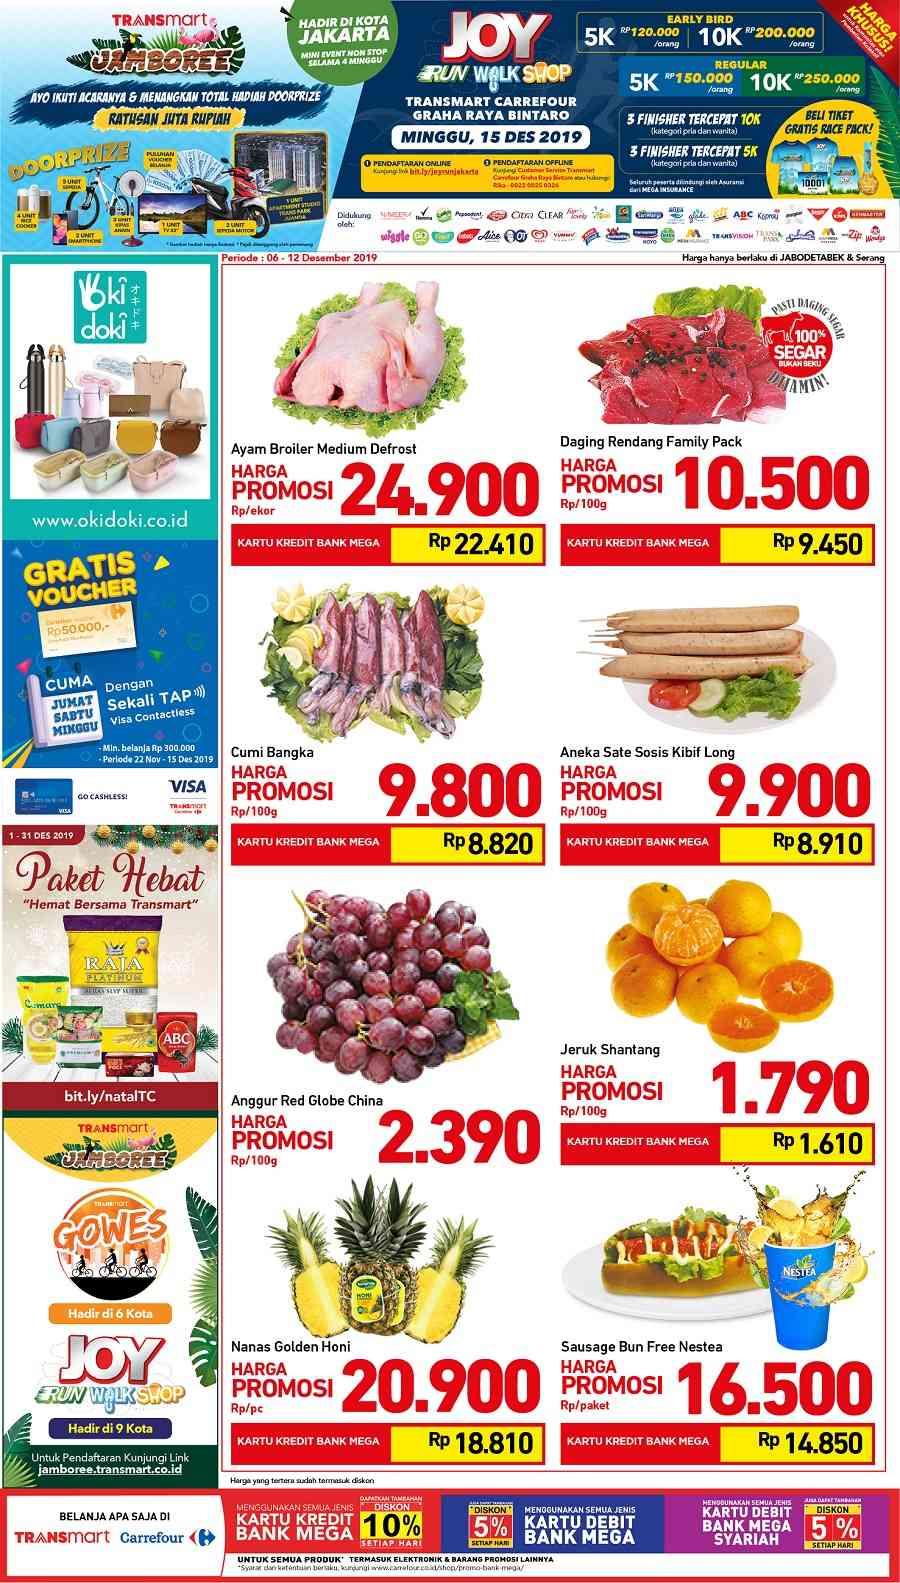 Diskon Promo Carrefour Katalog Promo Hebat Sepekan Fresh Periode 6-12 Desember 2019